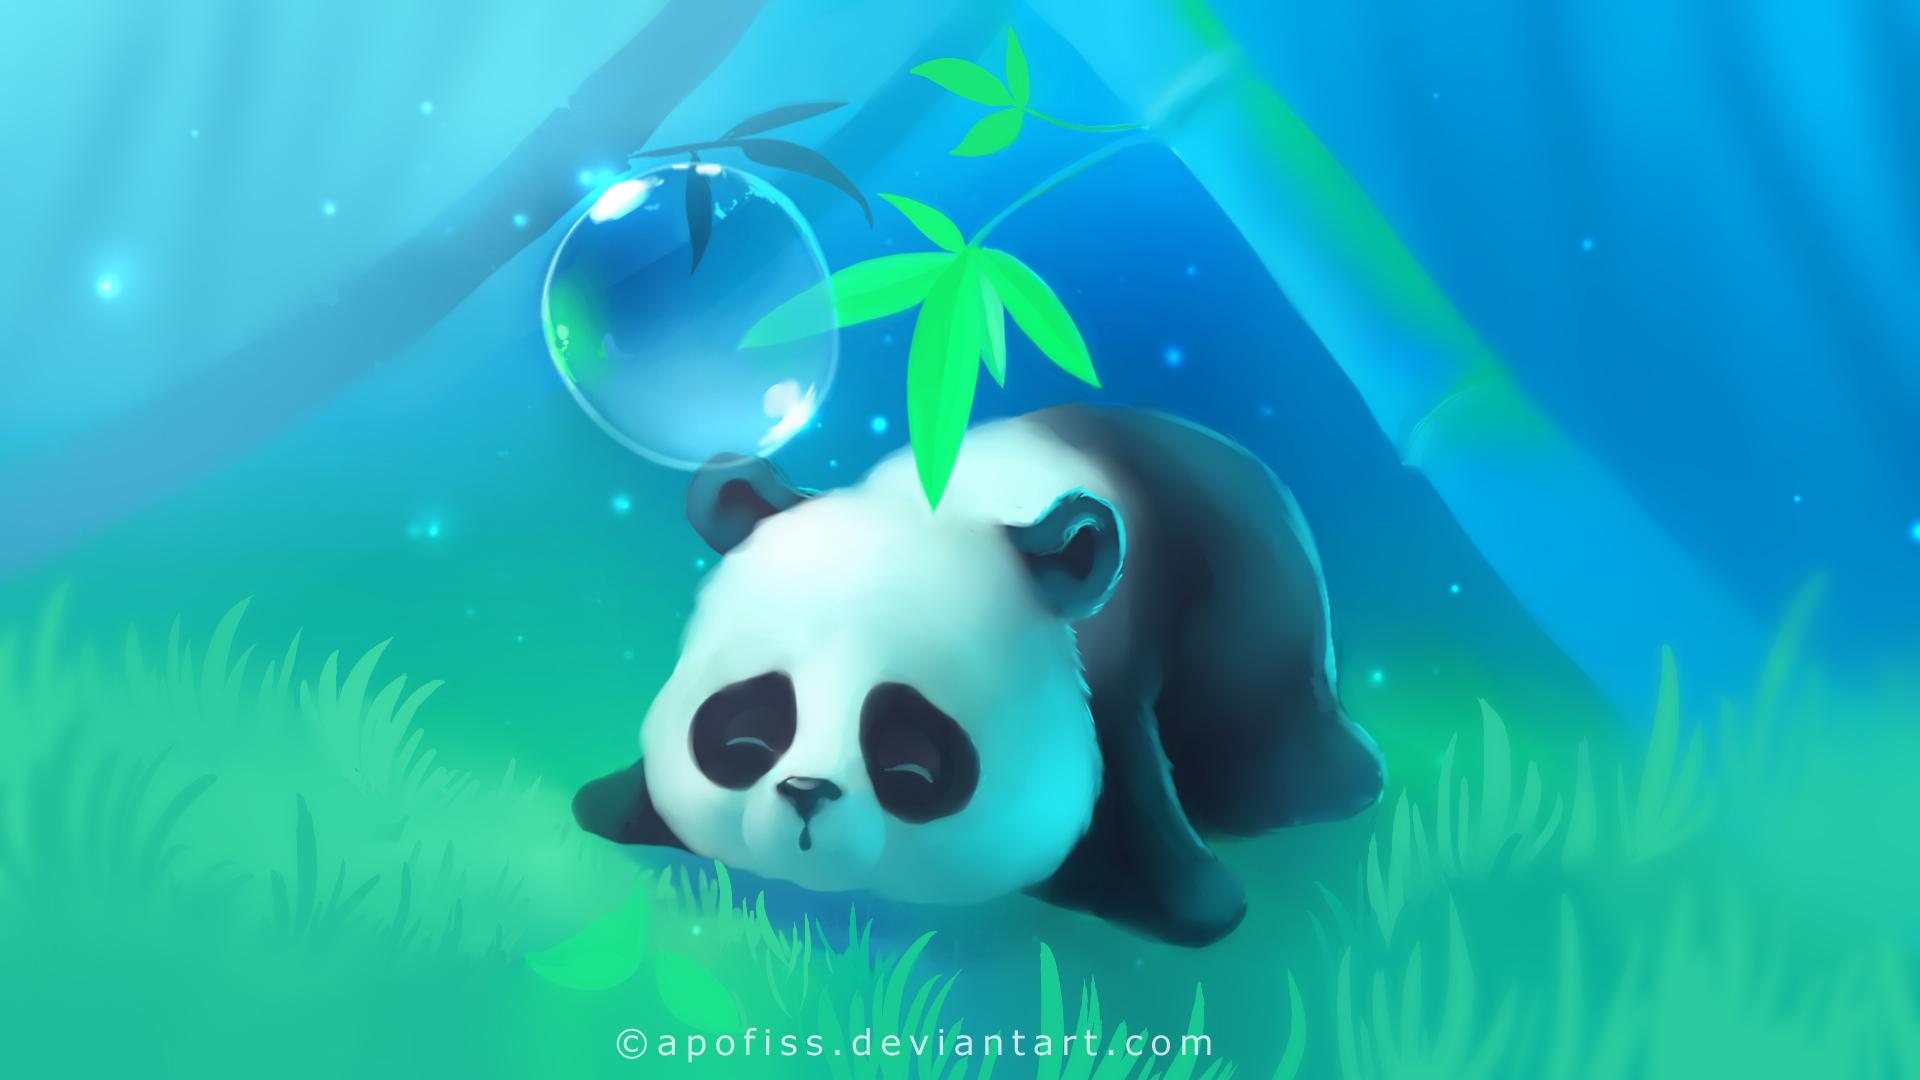 Wallpaper apofiss panda lay sleeping bubble tree 1920x1080